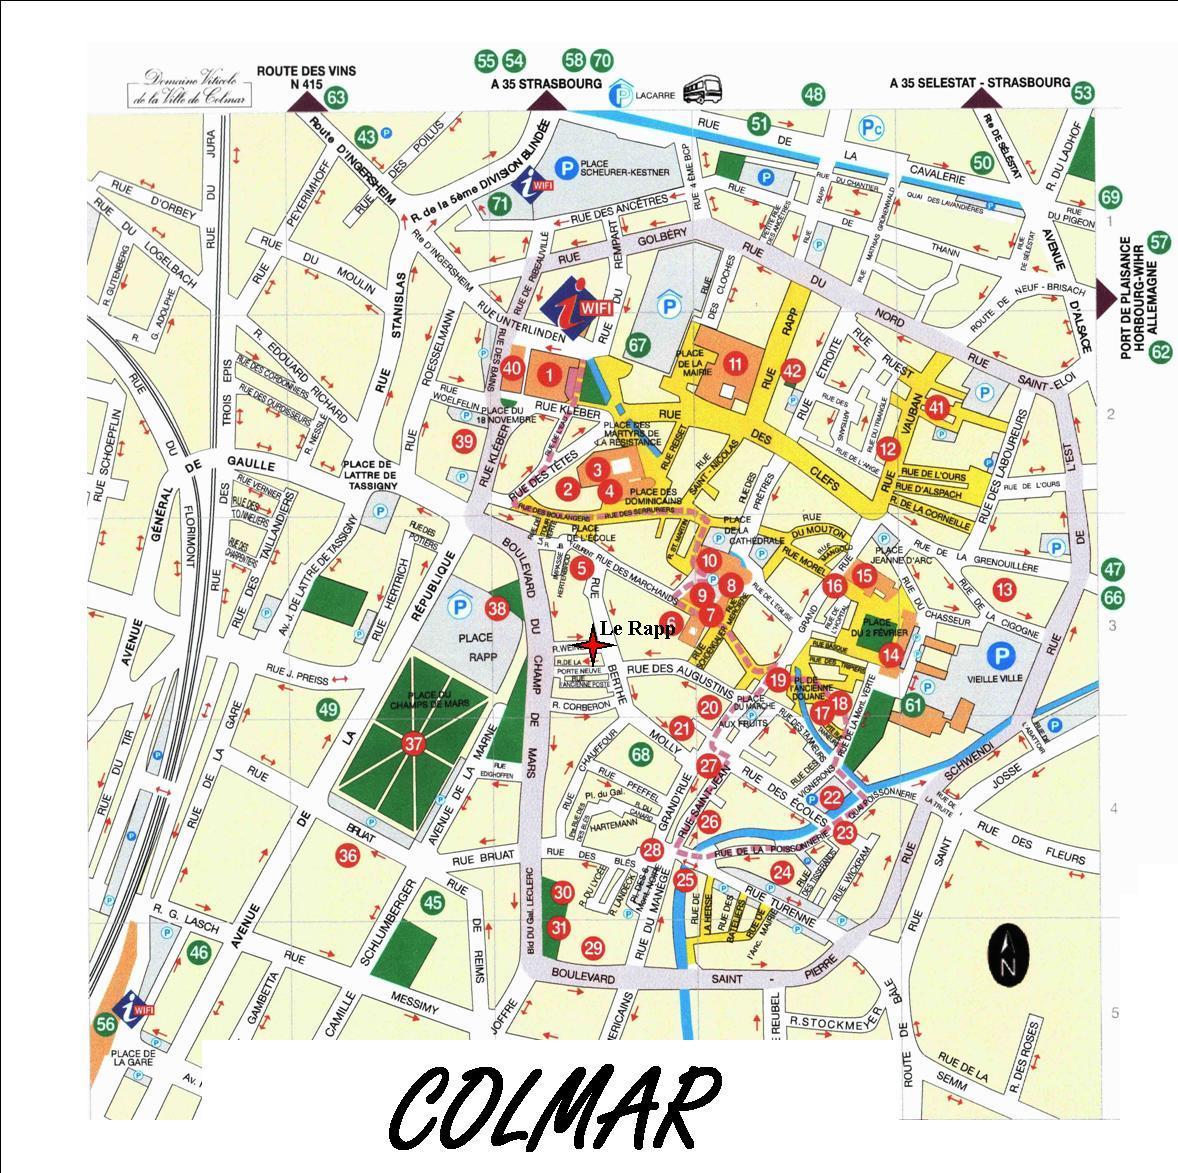 Hotel Colmar Centre Ville